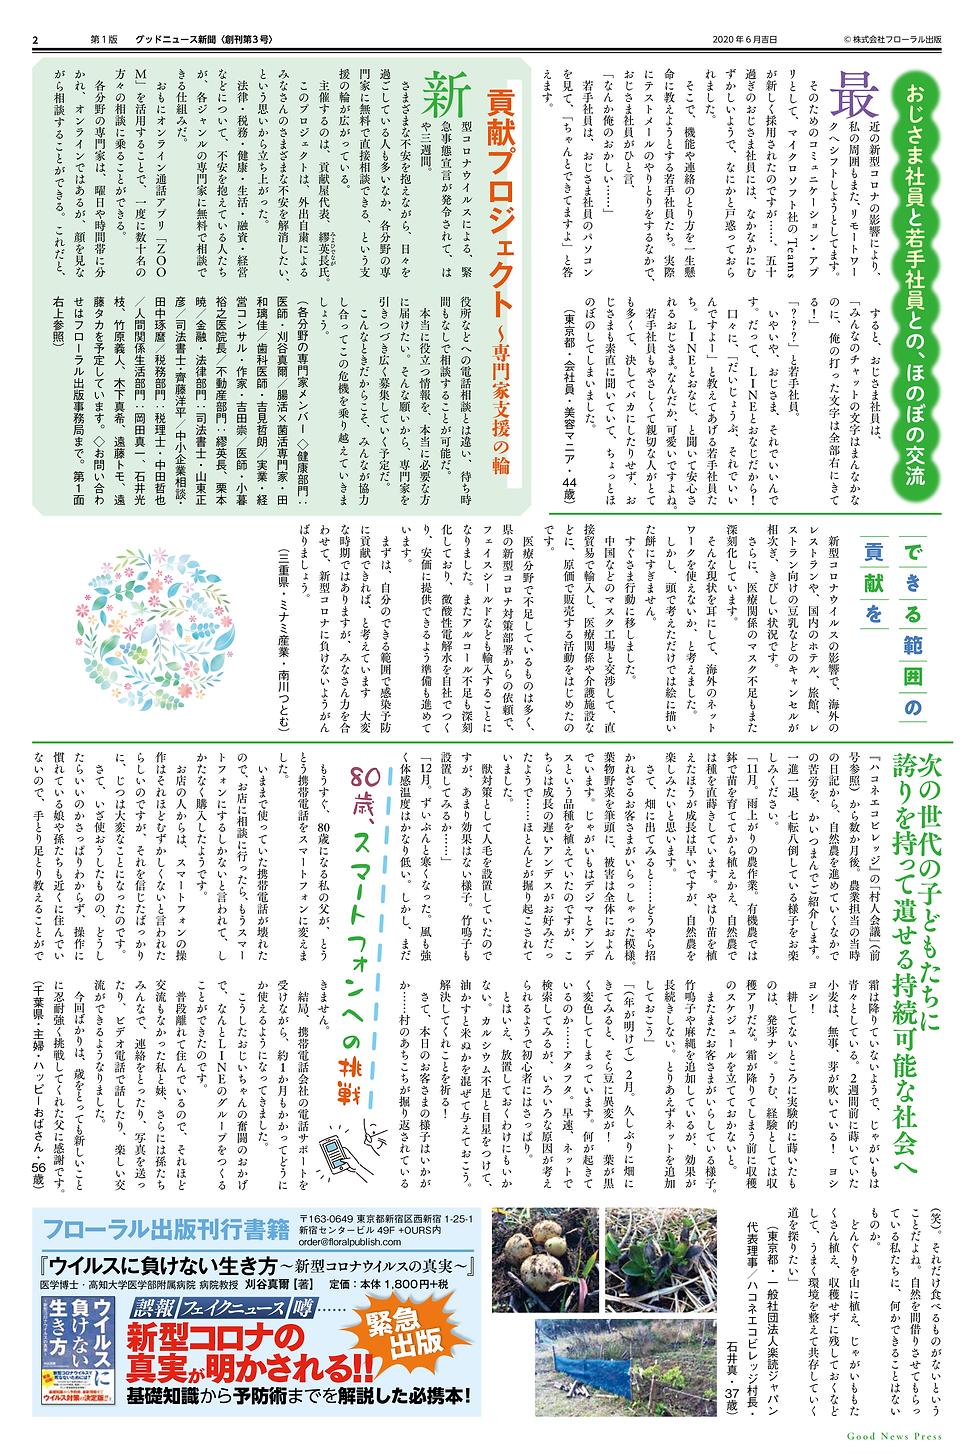 GNP3号 web用_ページ_2.png